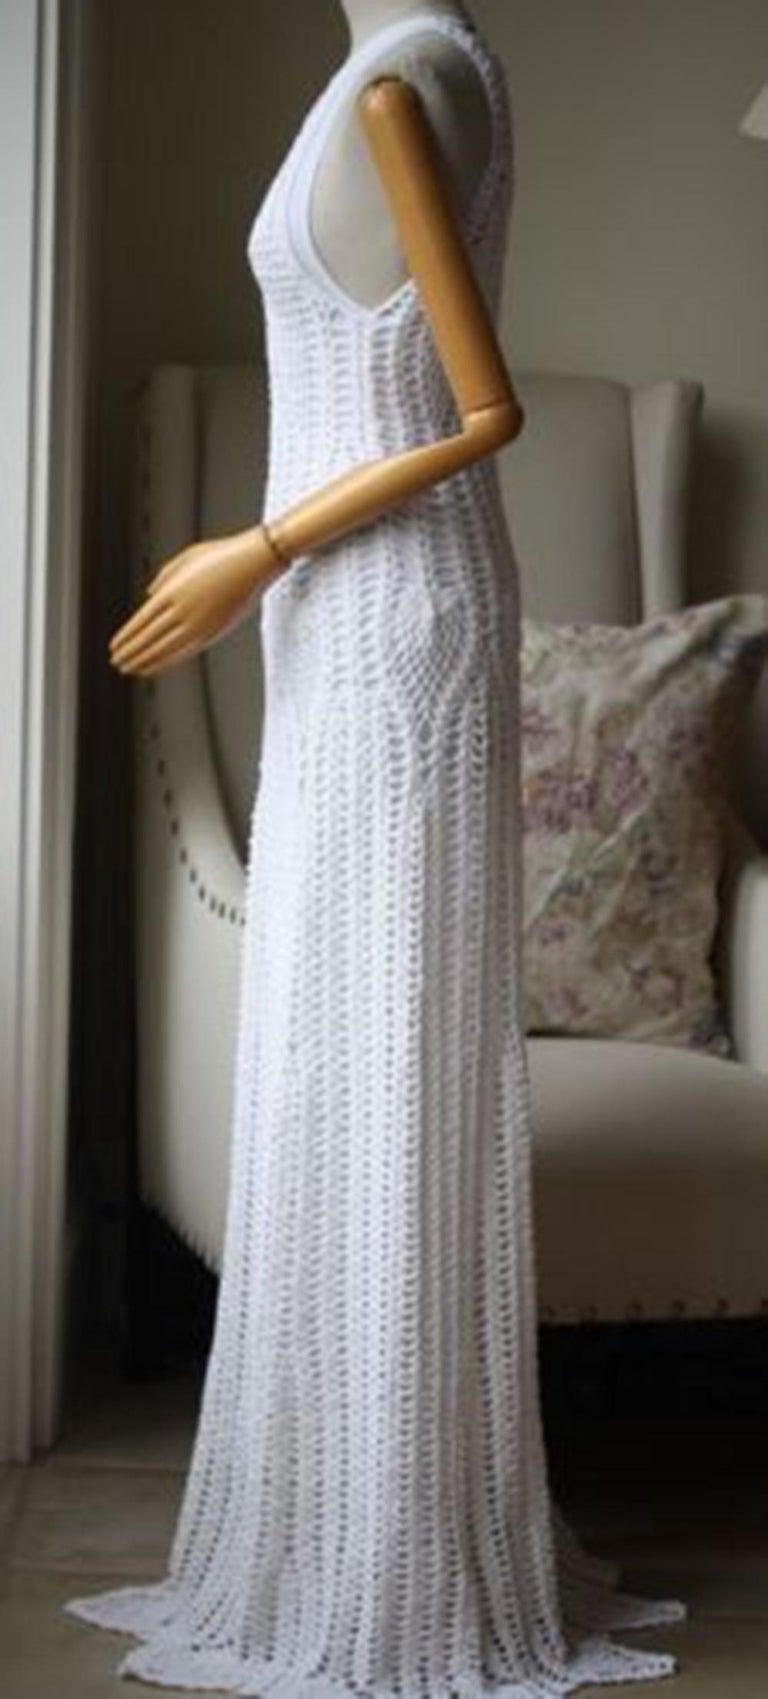 Gray Rosetta Getty Crocheted Cotton-Blend Maxi Dress For Sale